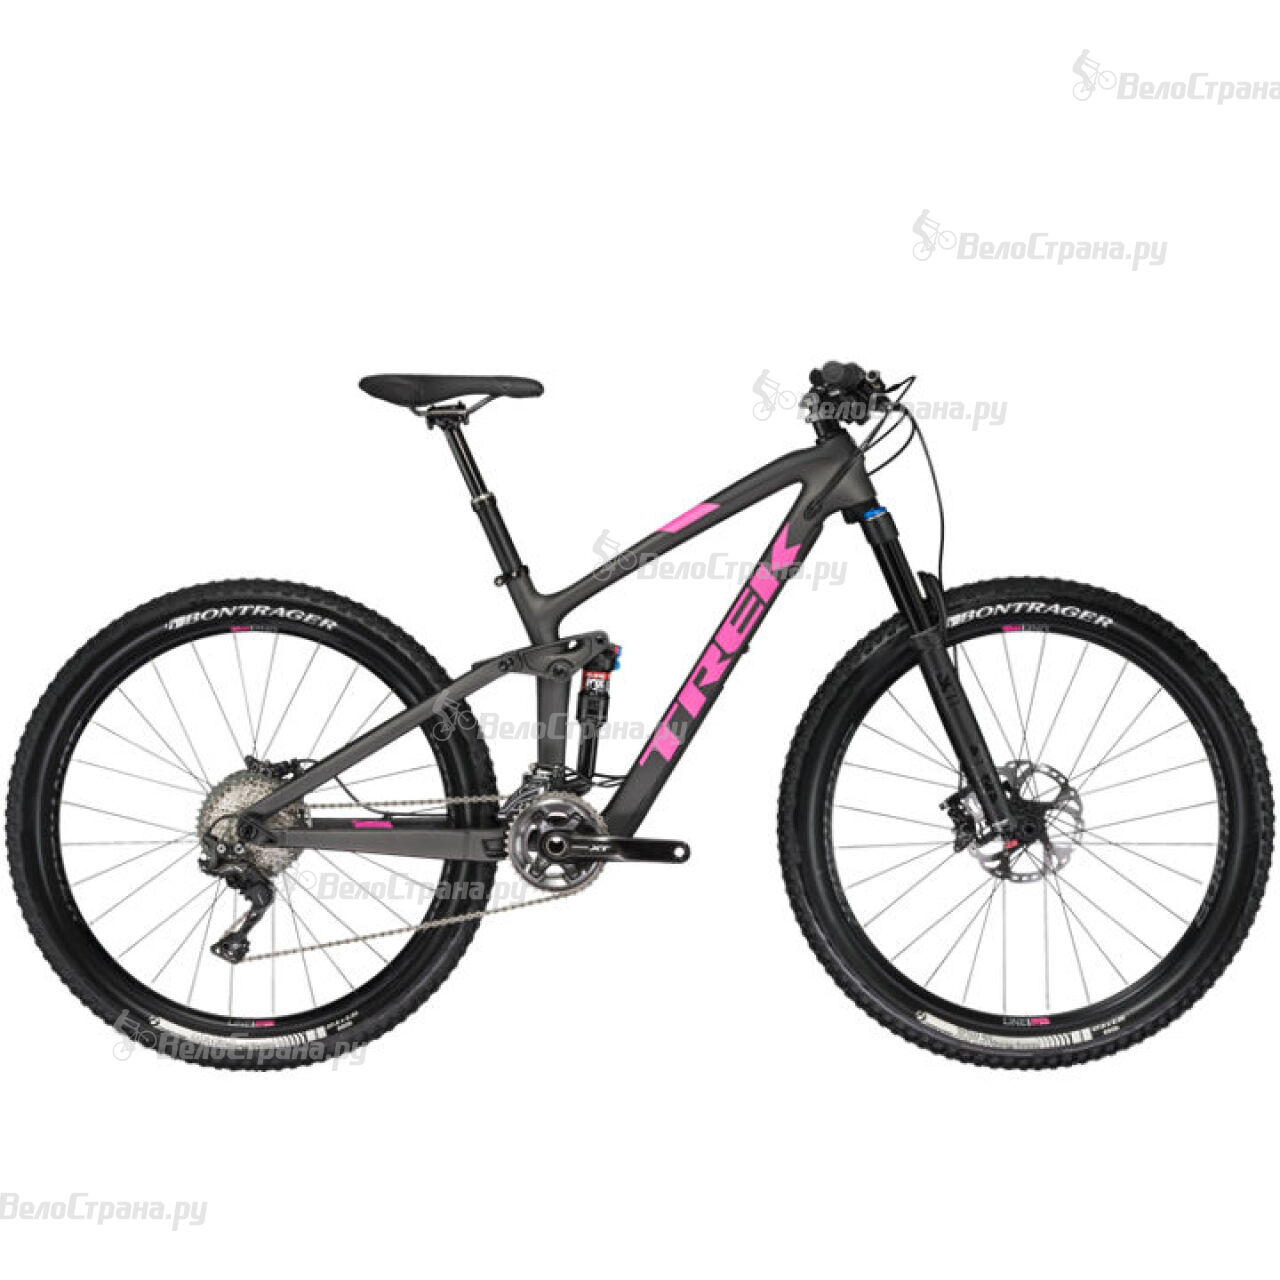 Велосипед Trek Fuel EX 9.8 WSD (2017)